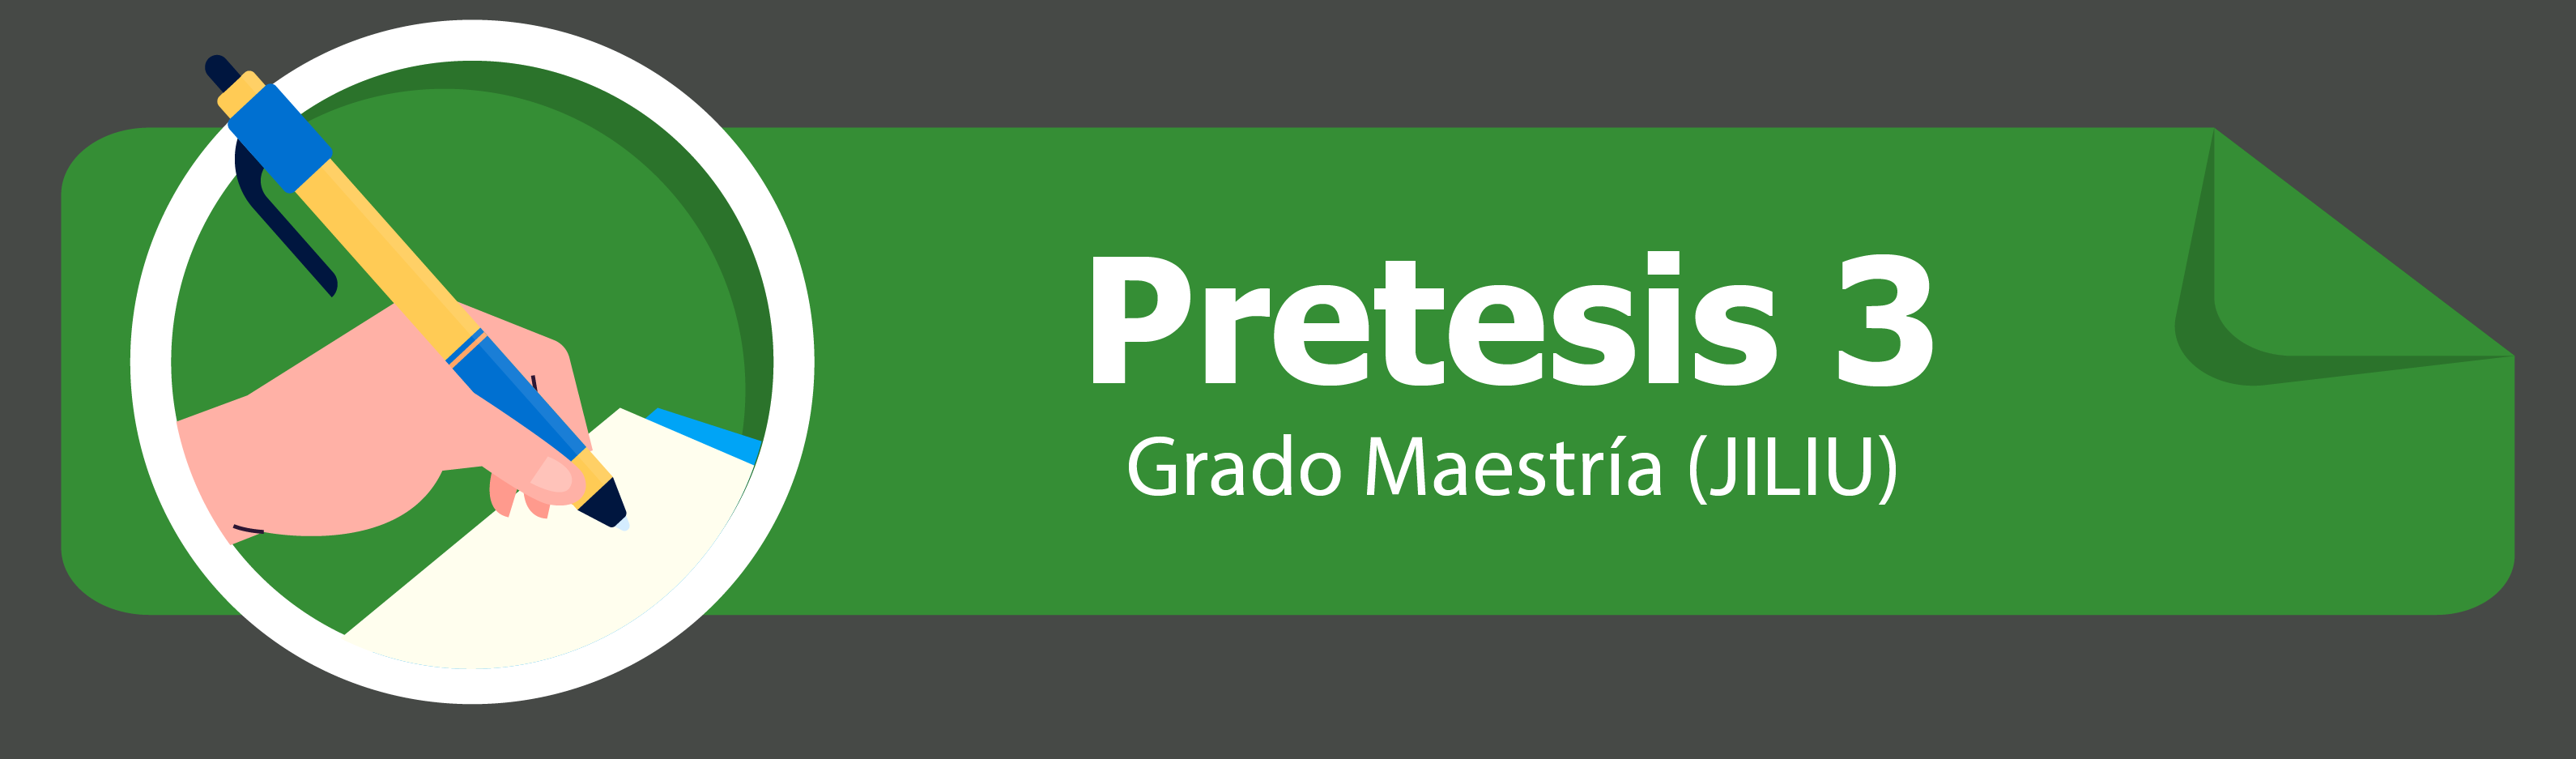 Pretesis 3